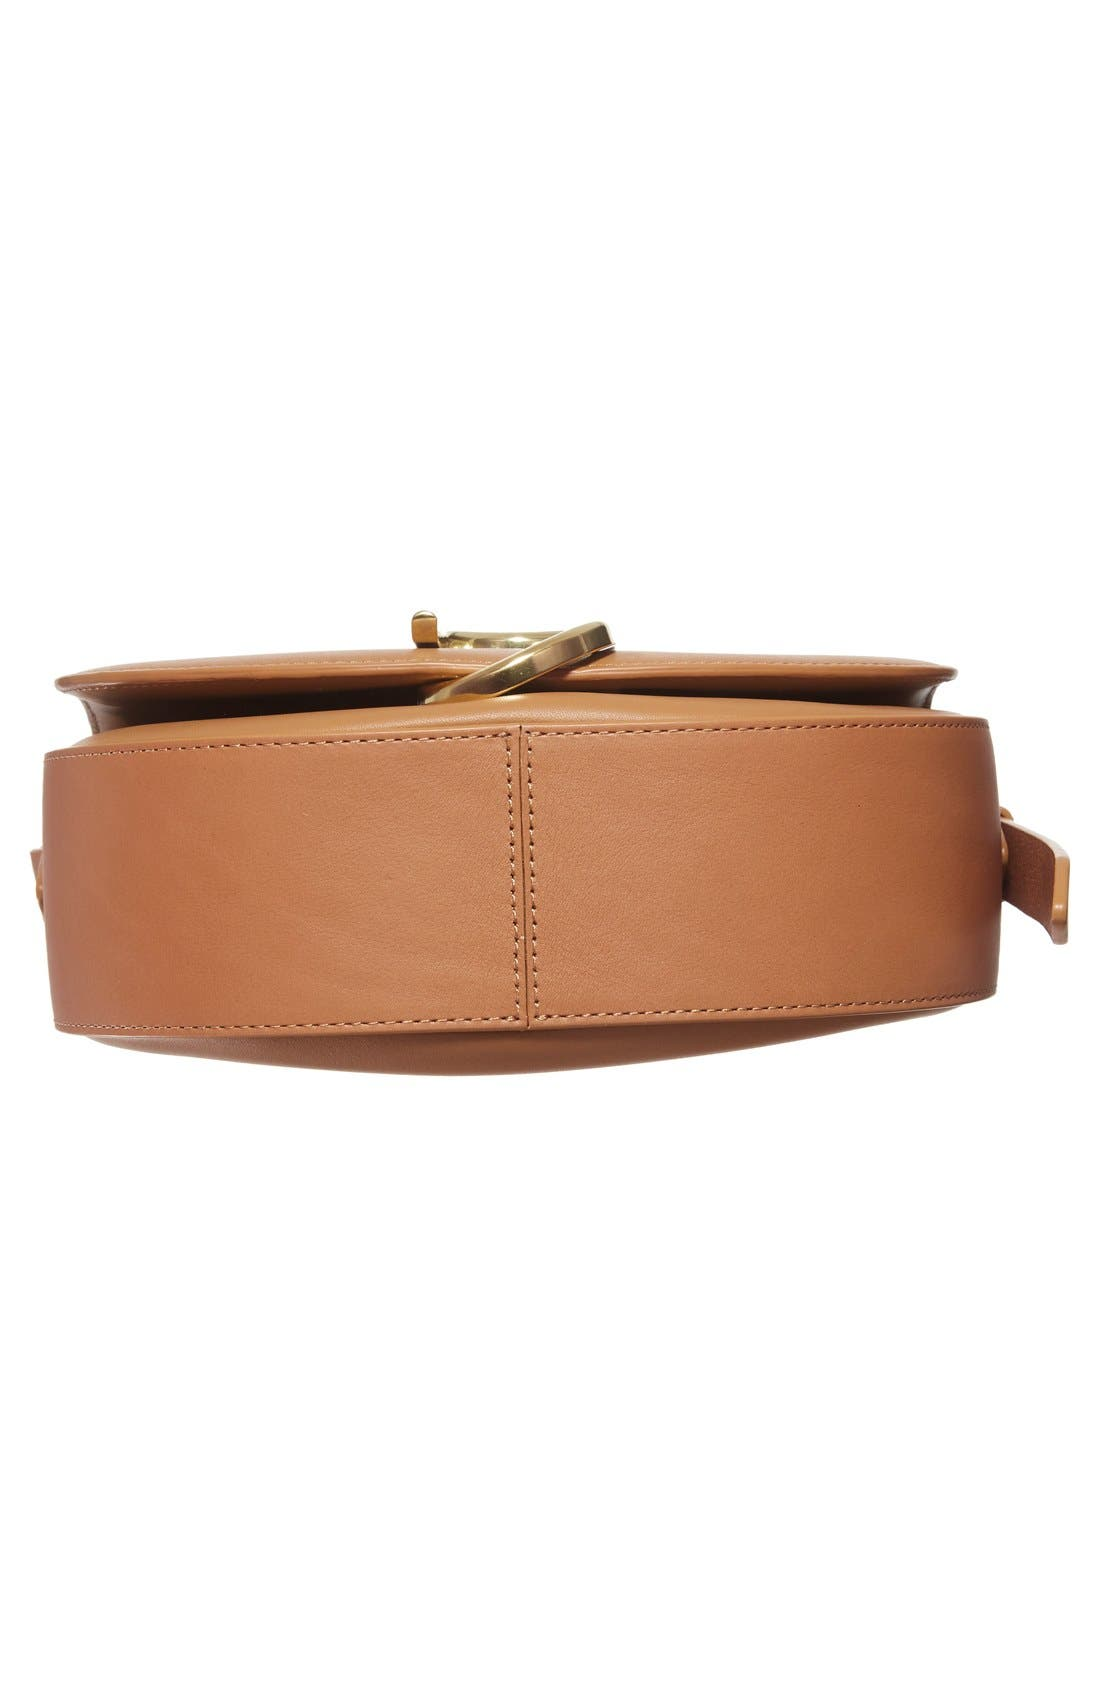 Alix Leather Saddle Bag,                             Alternate thumbnail 17, color,